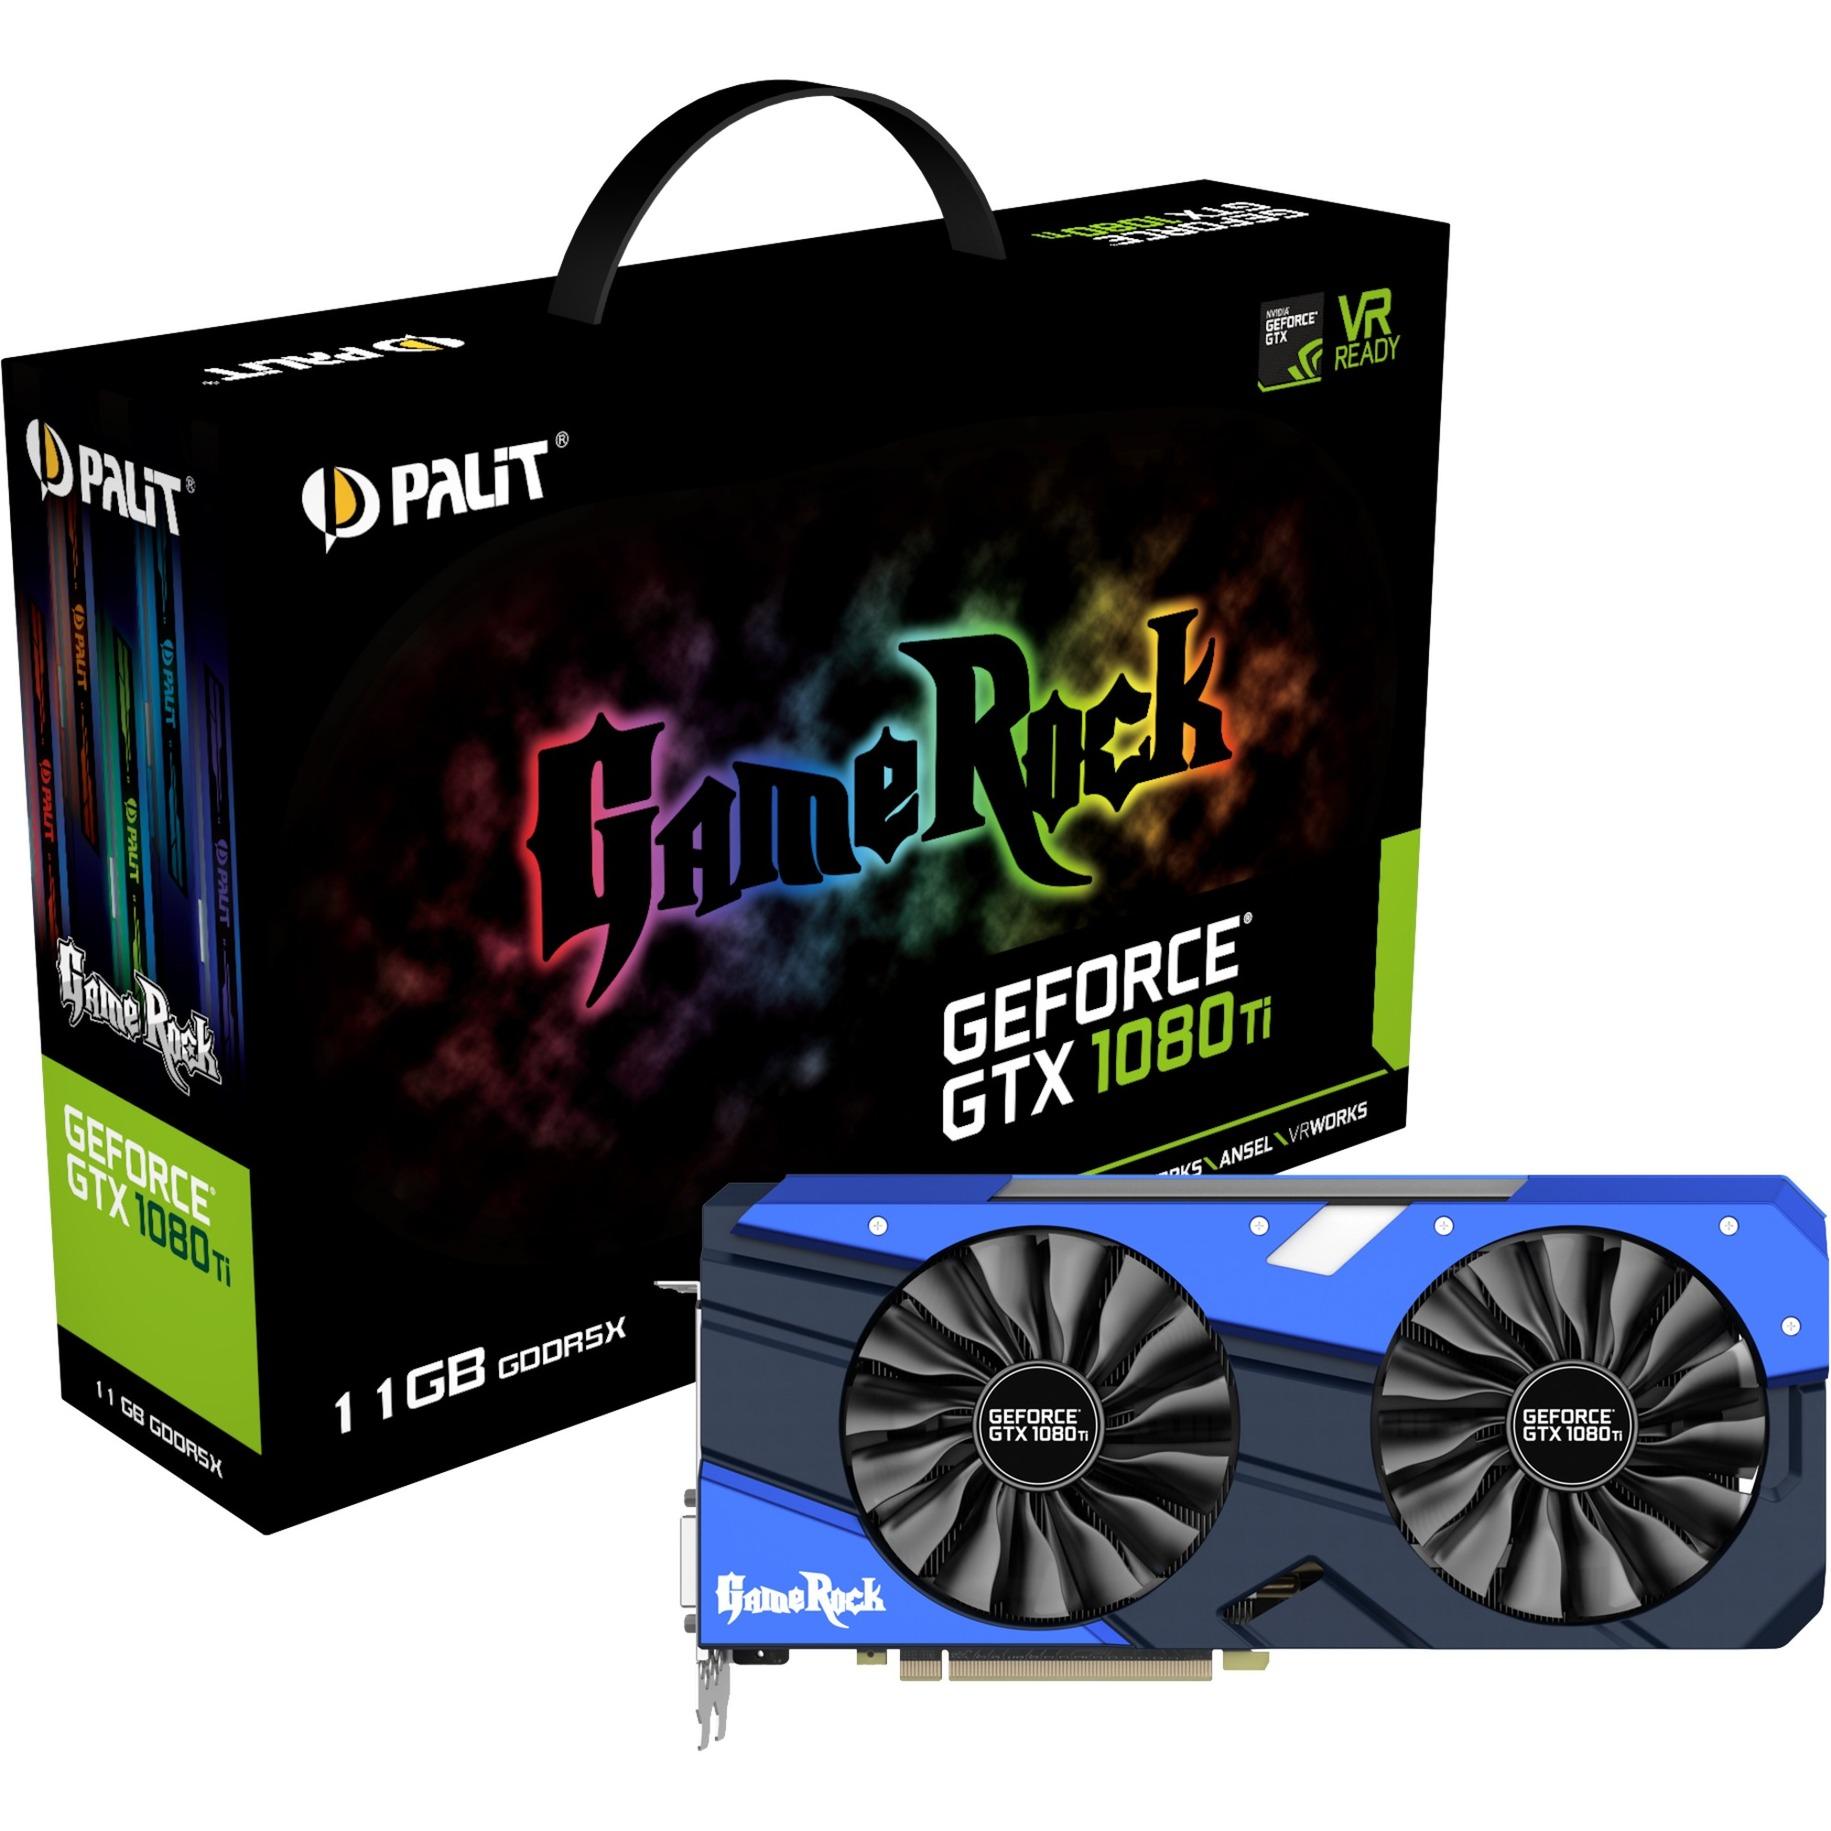 GeForce GTX 1080 Ti Gamerock, Tarjeta gráfica